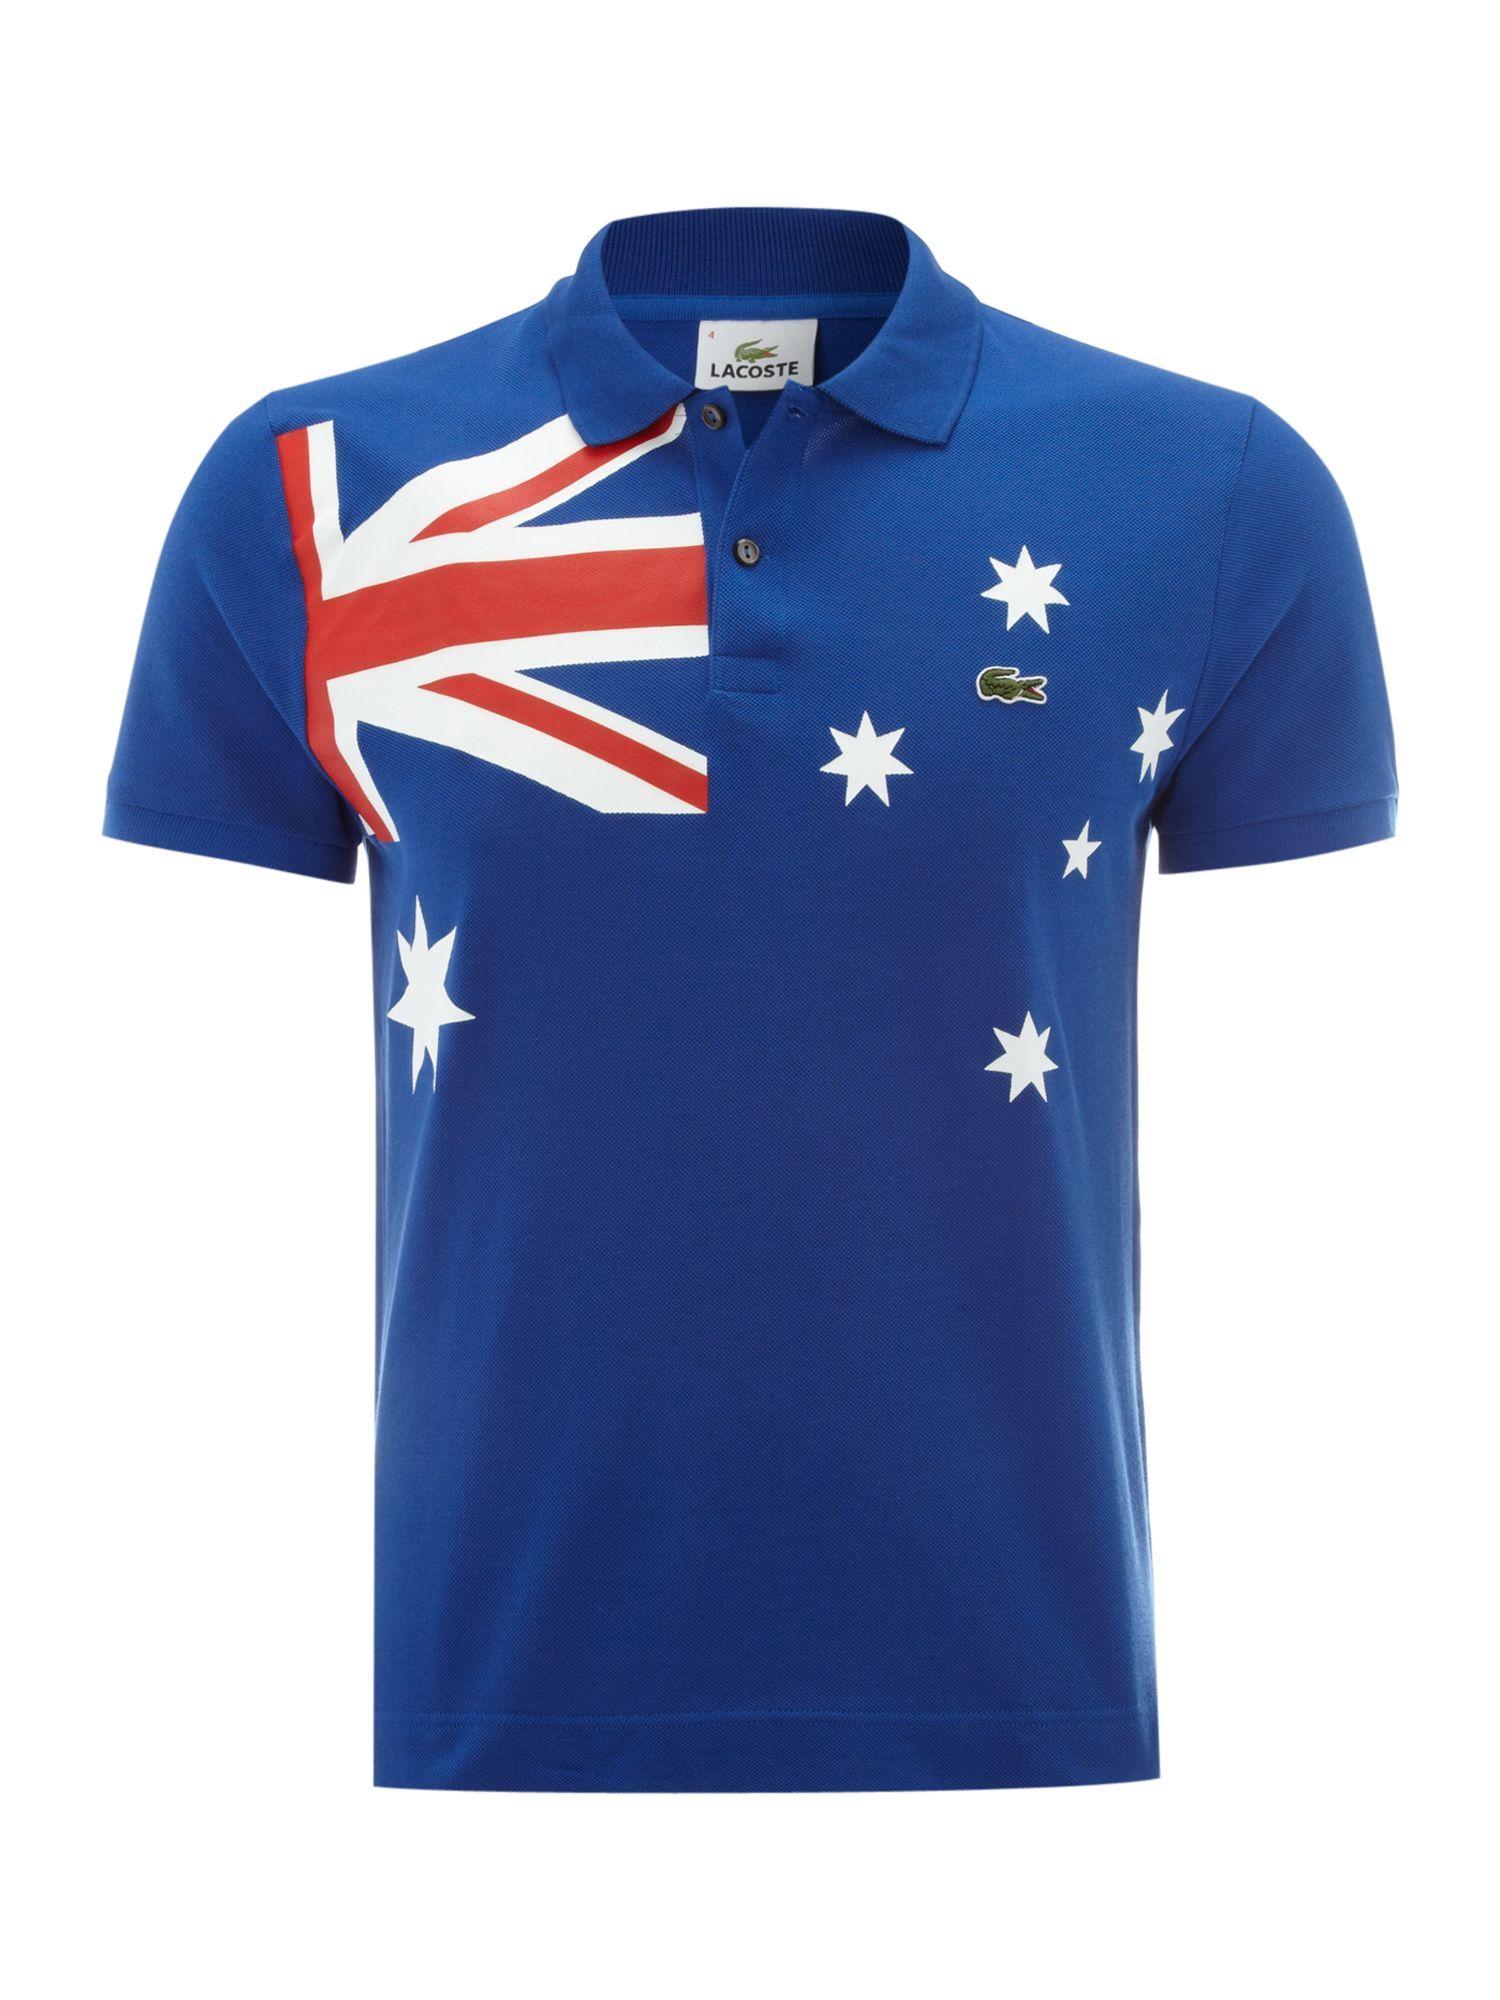 The best polo shirts for men - Lacoste Slim Fit Australia Flag Polo Shirt Men